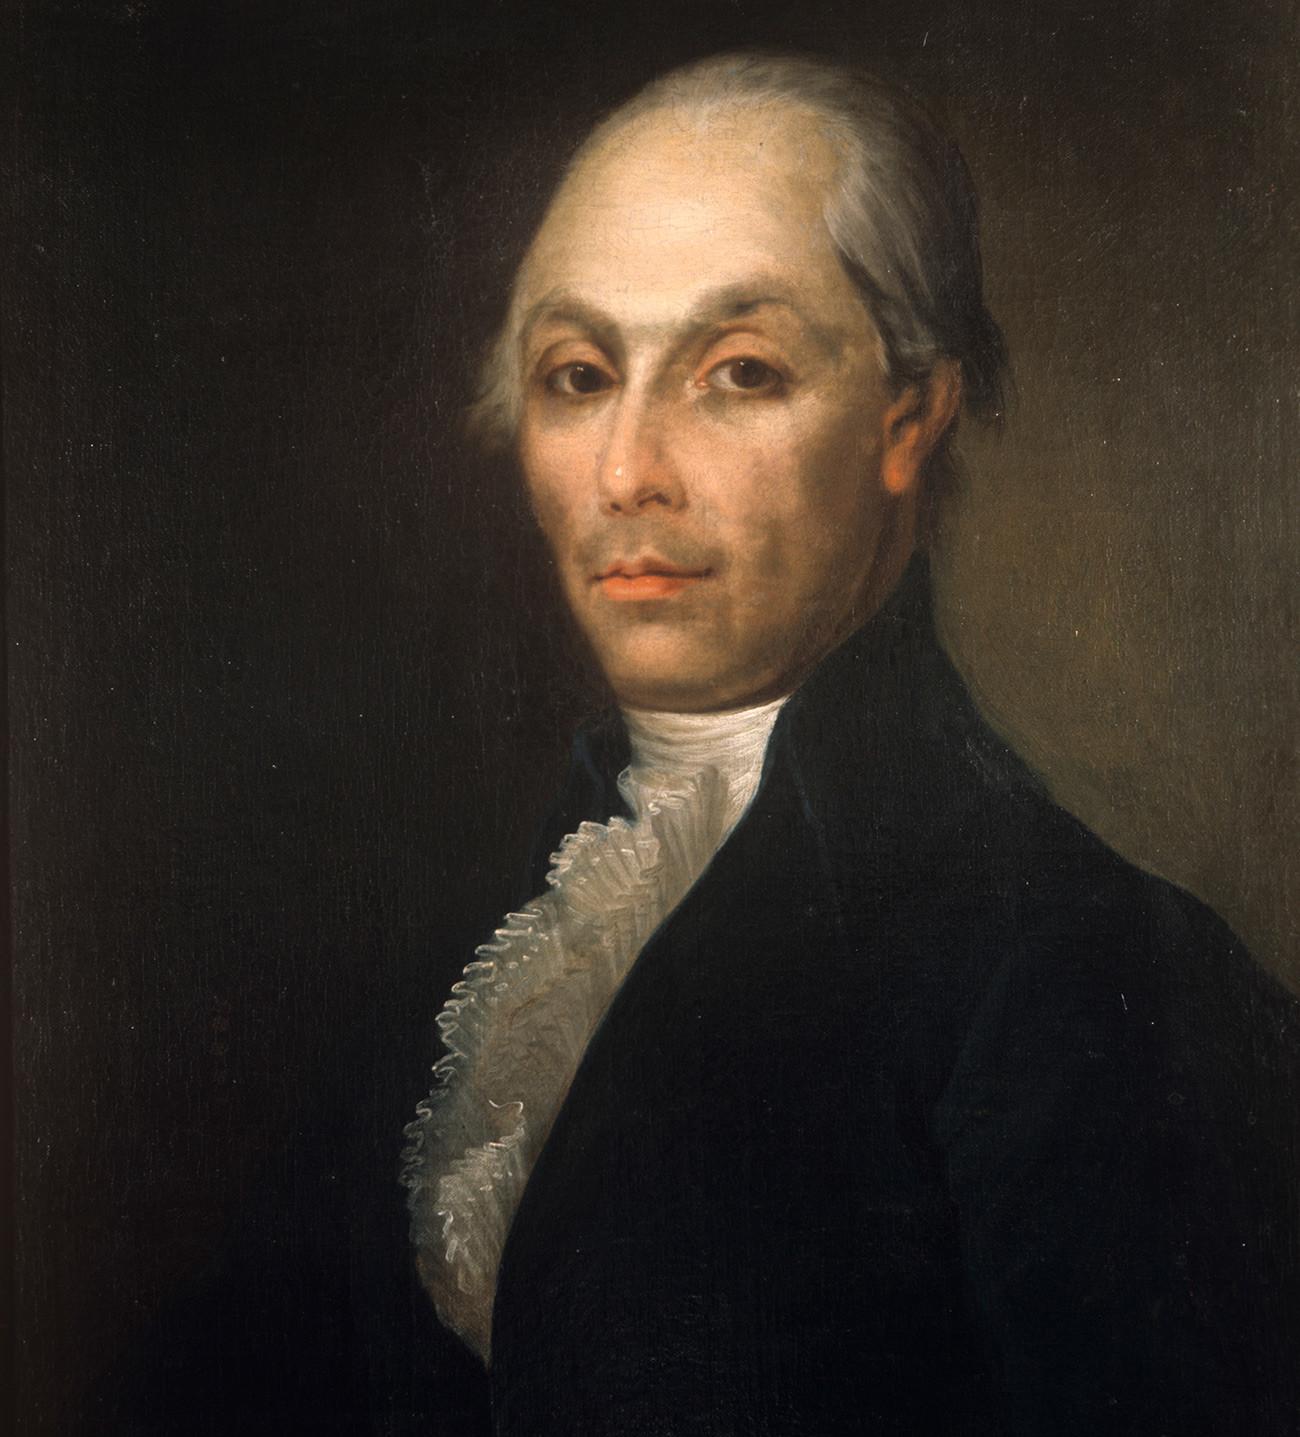 Portrait of Alexander Radishchev, who definitely was a member of the Russian intelligentsia.